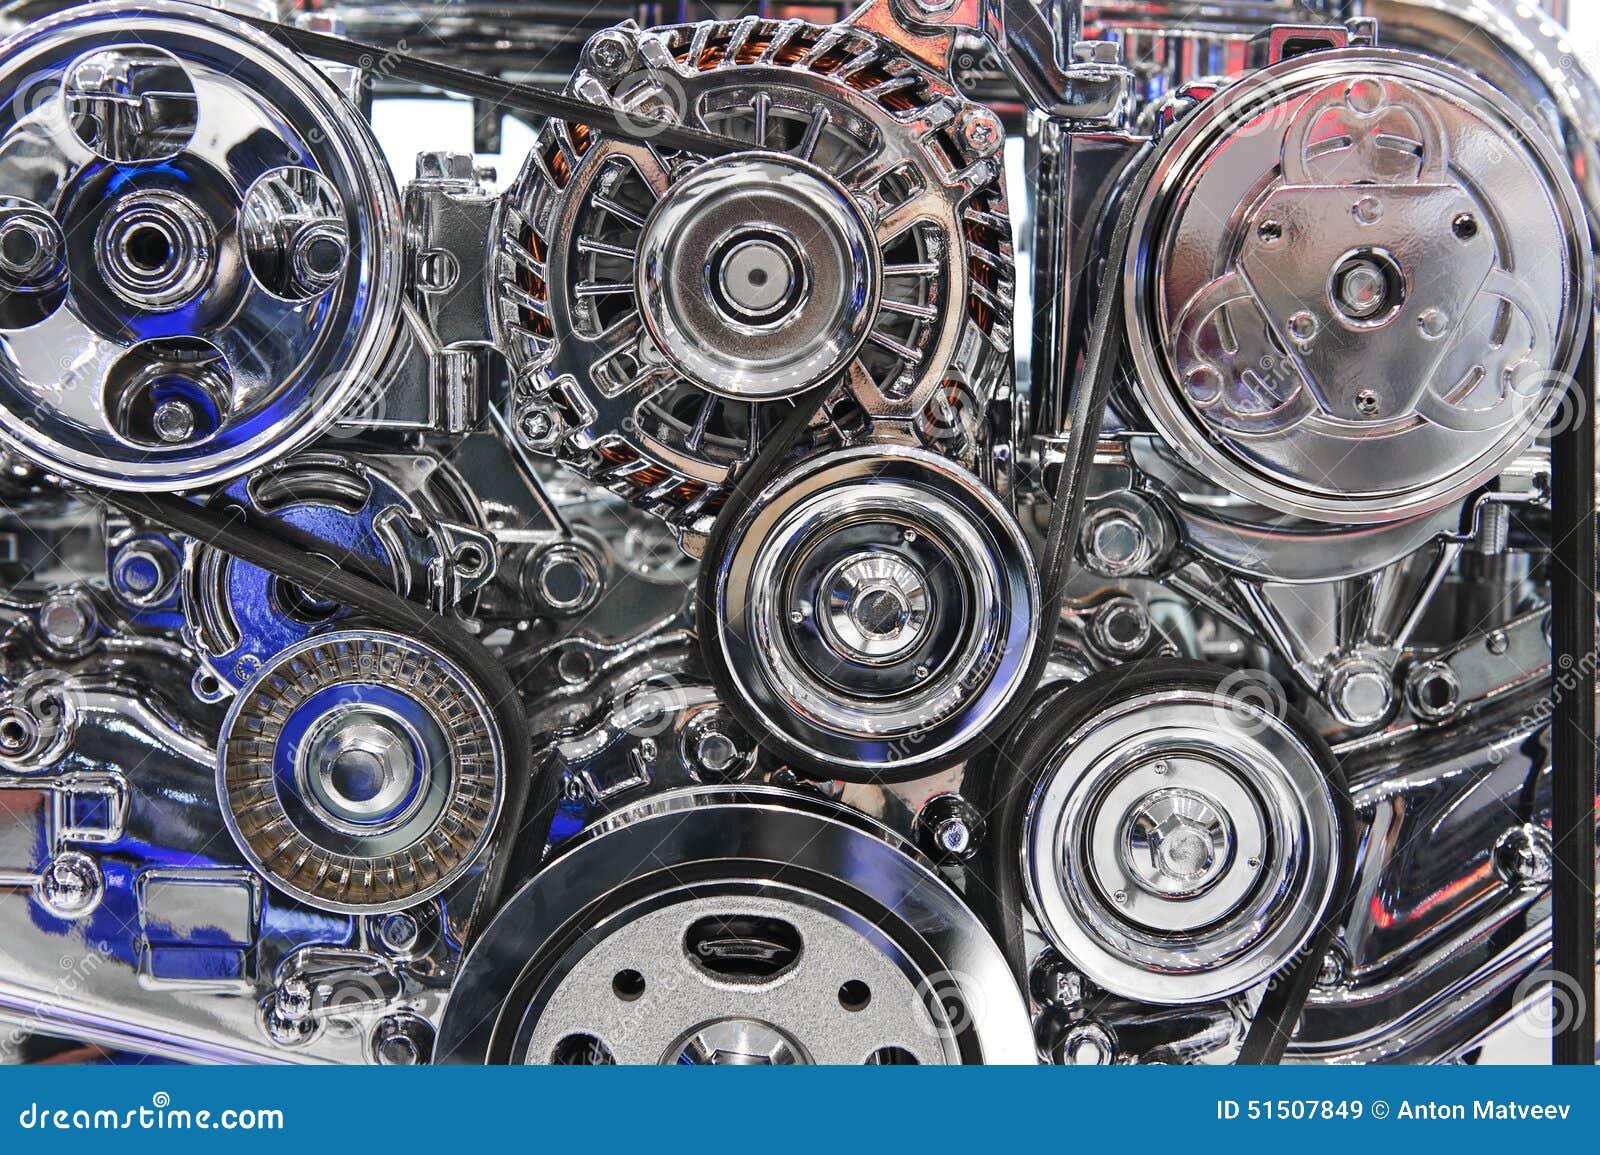 Sports Car Engine Parts : Sport car engine stock photo image